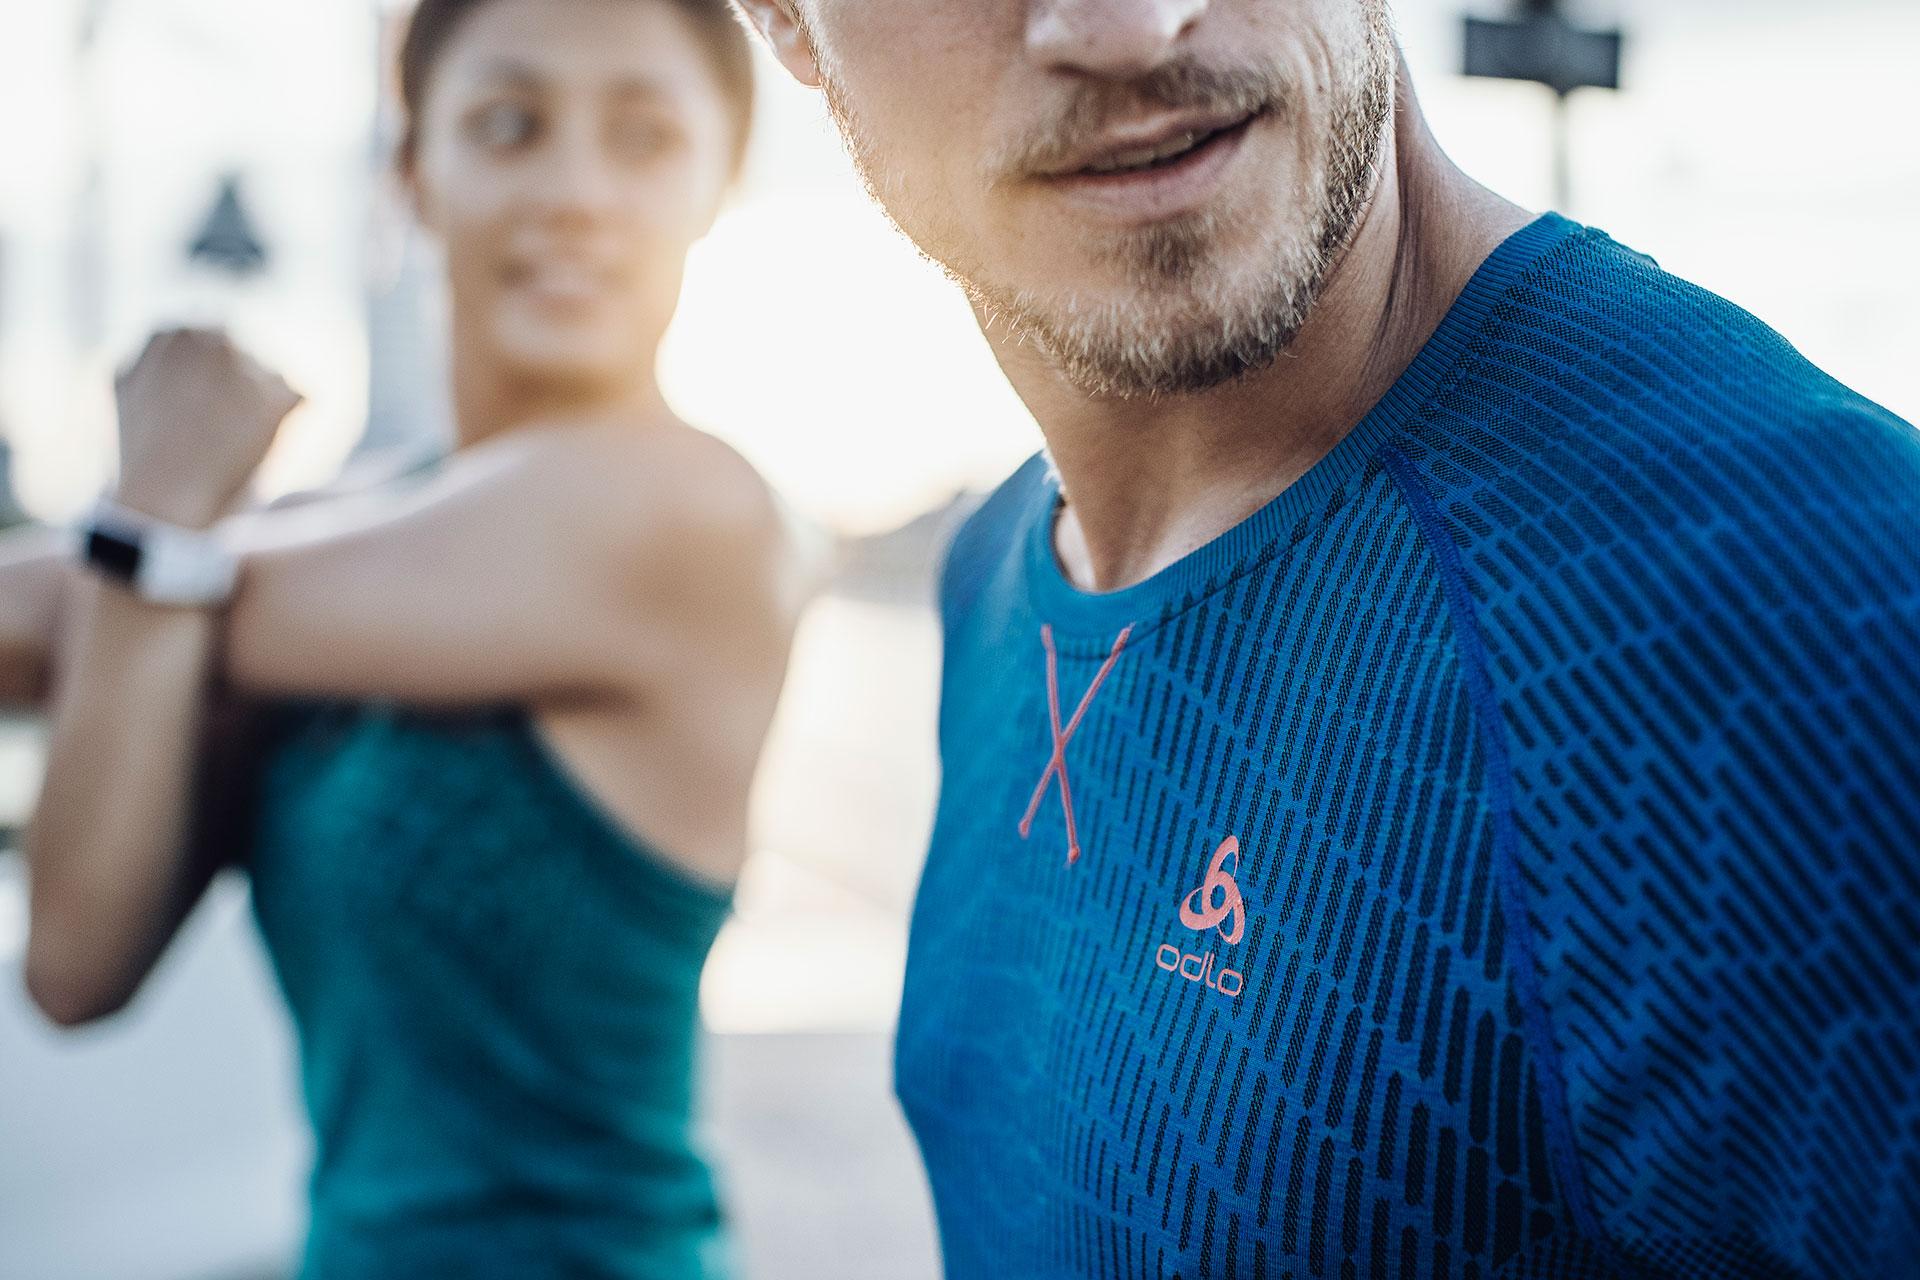 running fotograf michael mueller sport fitness training deutschland muenchen odlo kampagne